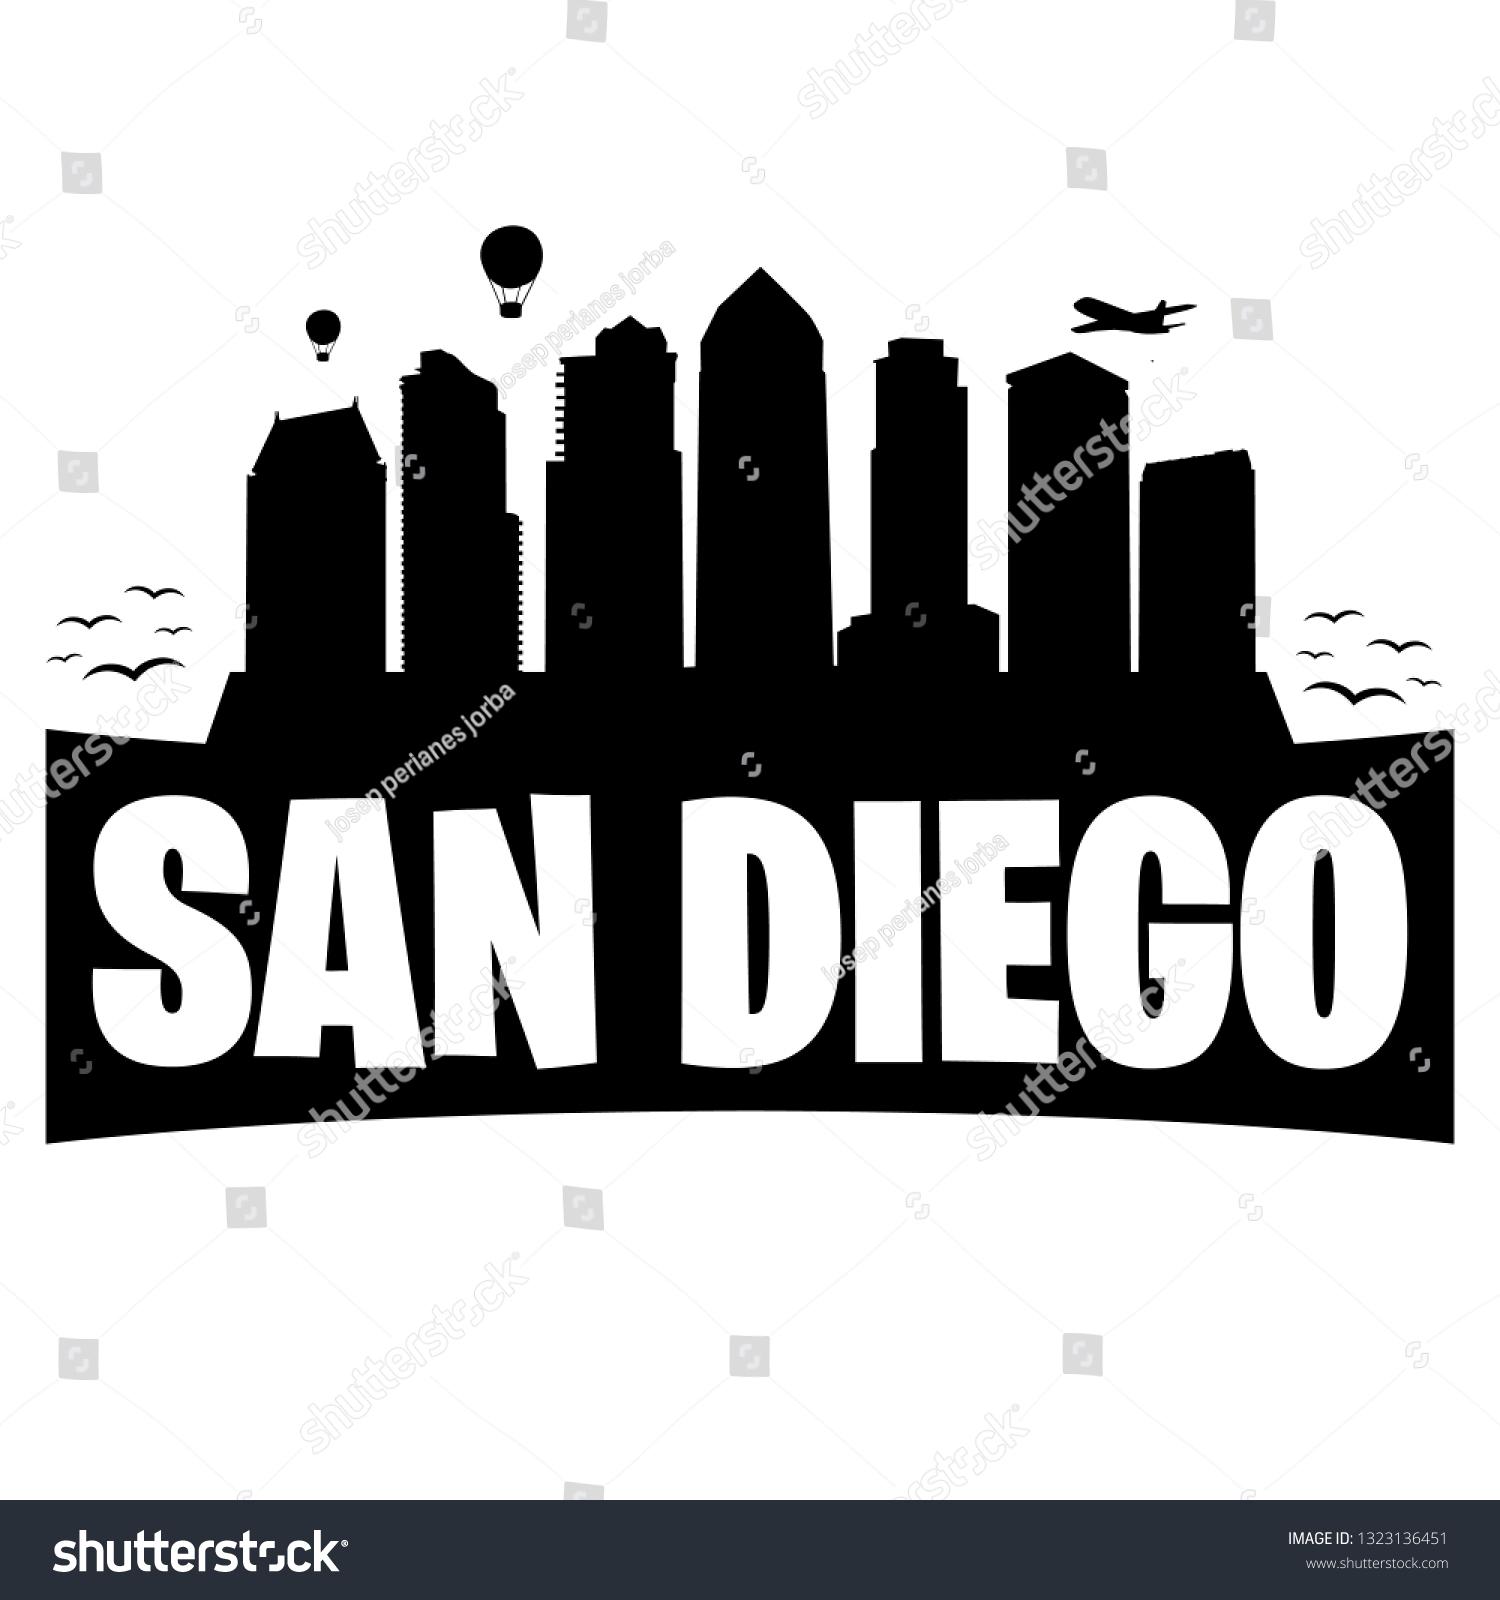 San Diego California City Skyline Silhouette Stock Vector Royalty Free 1323136451